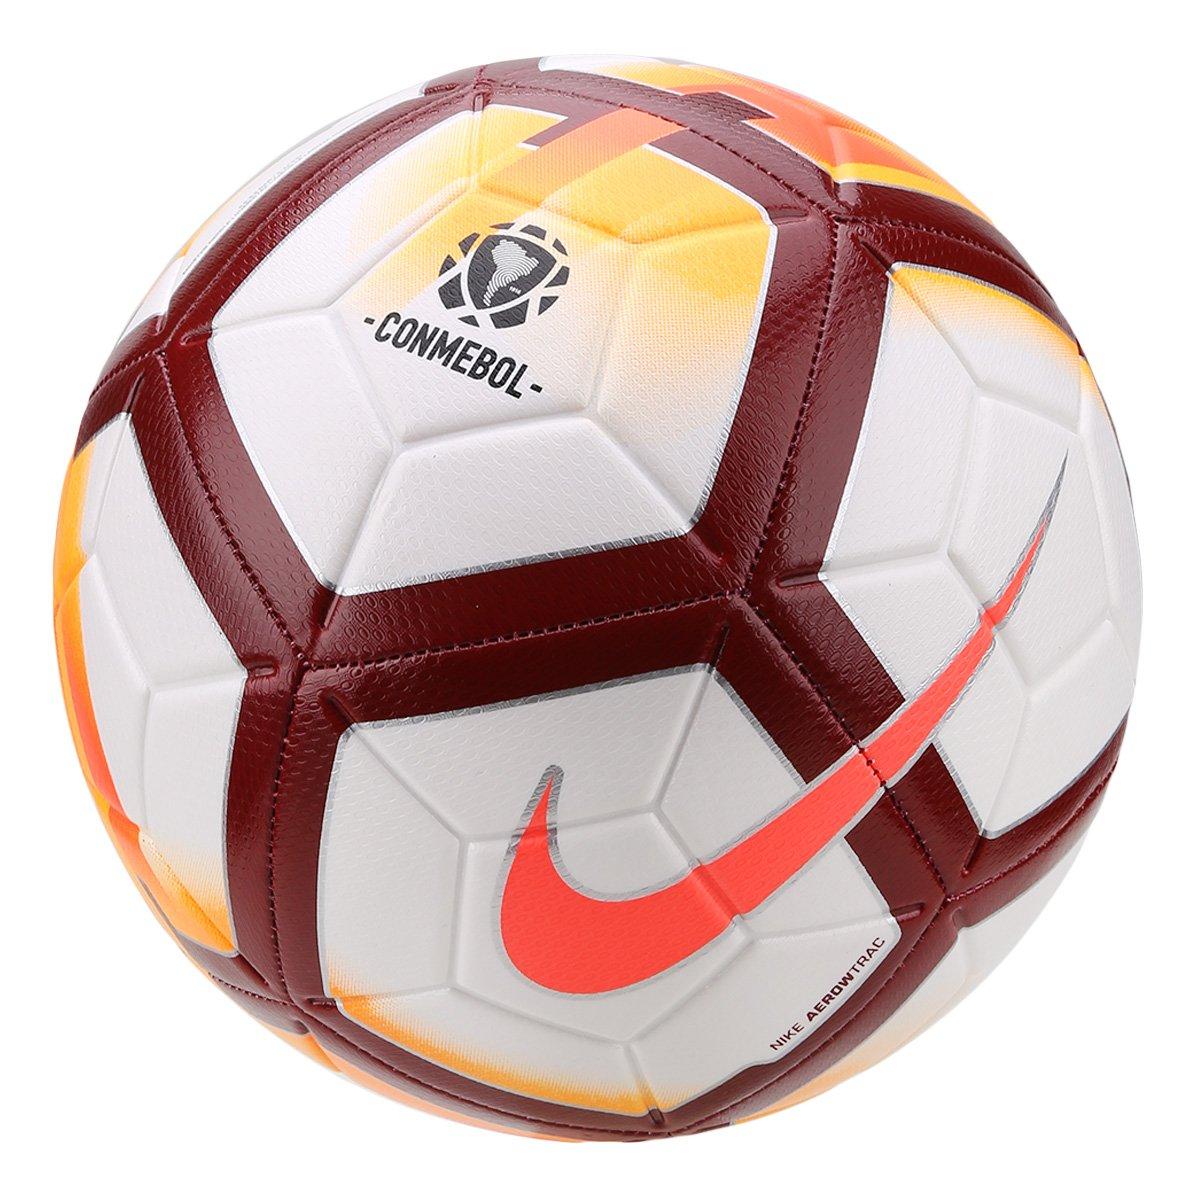 5943f667d5 Bola de Futebol Campo Nike CONMEBOL CSF Strike - Branco e Laranja ...